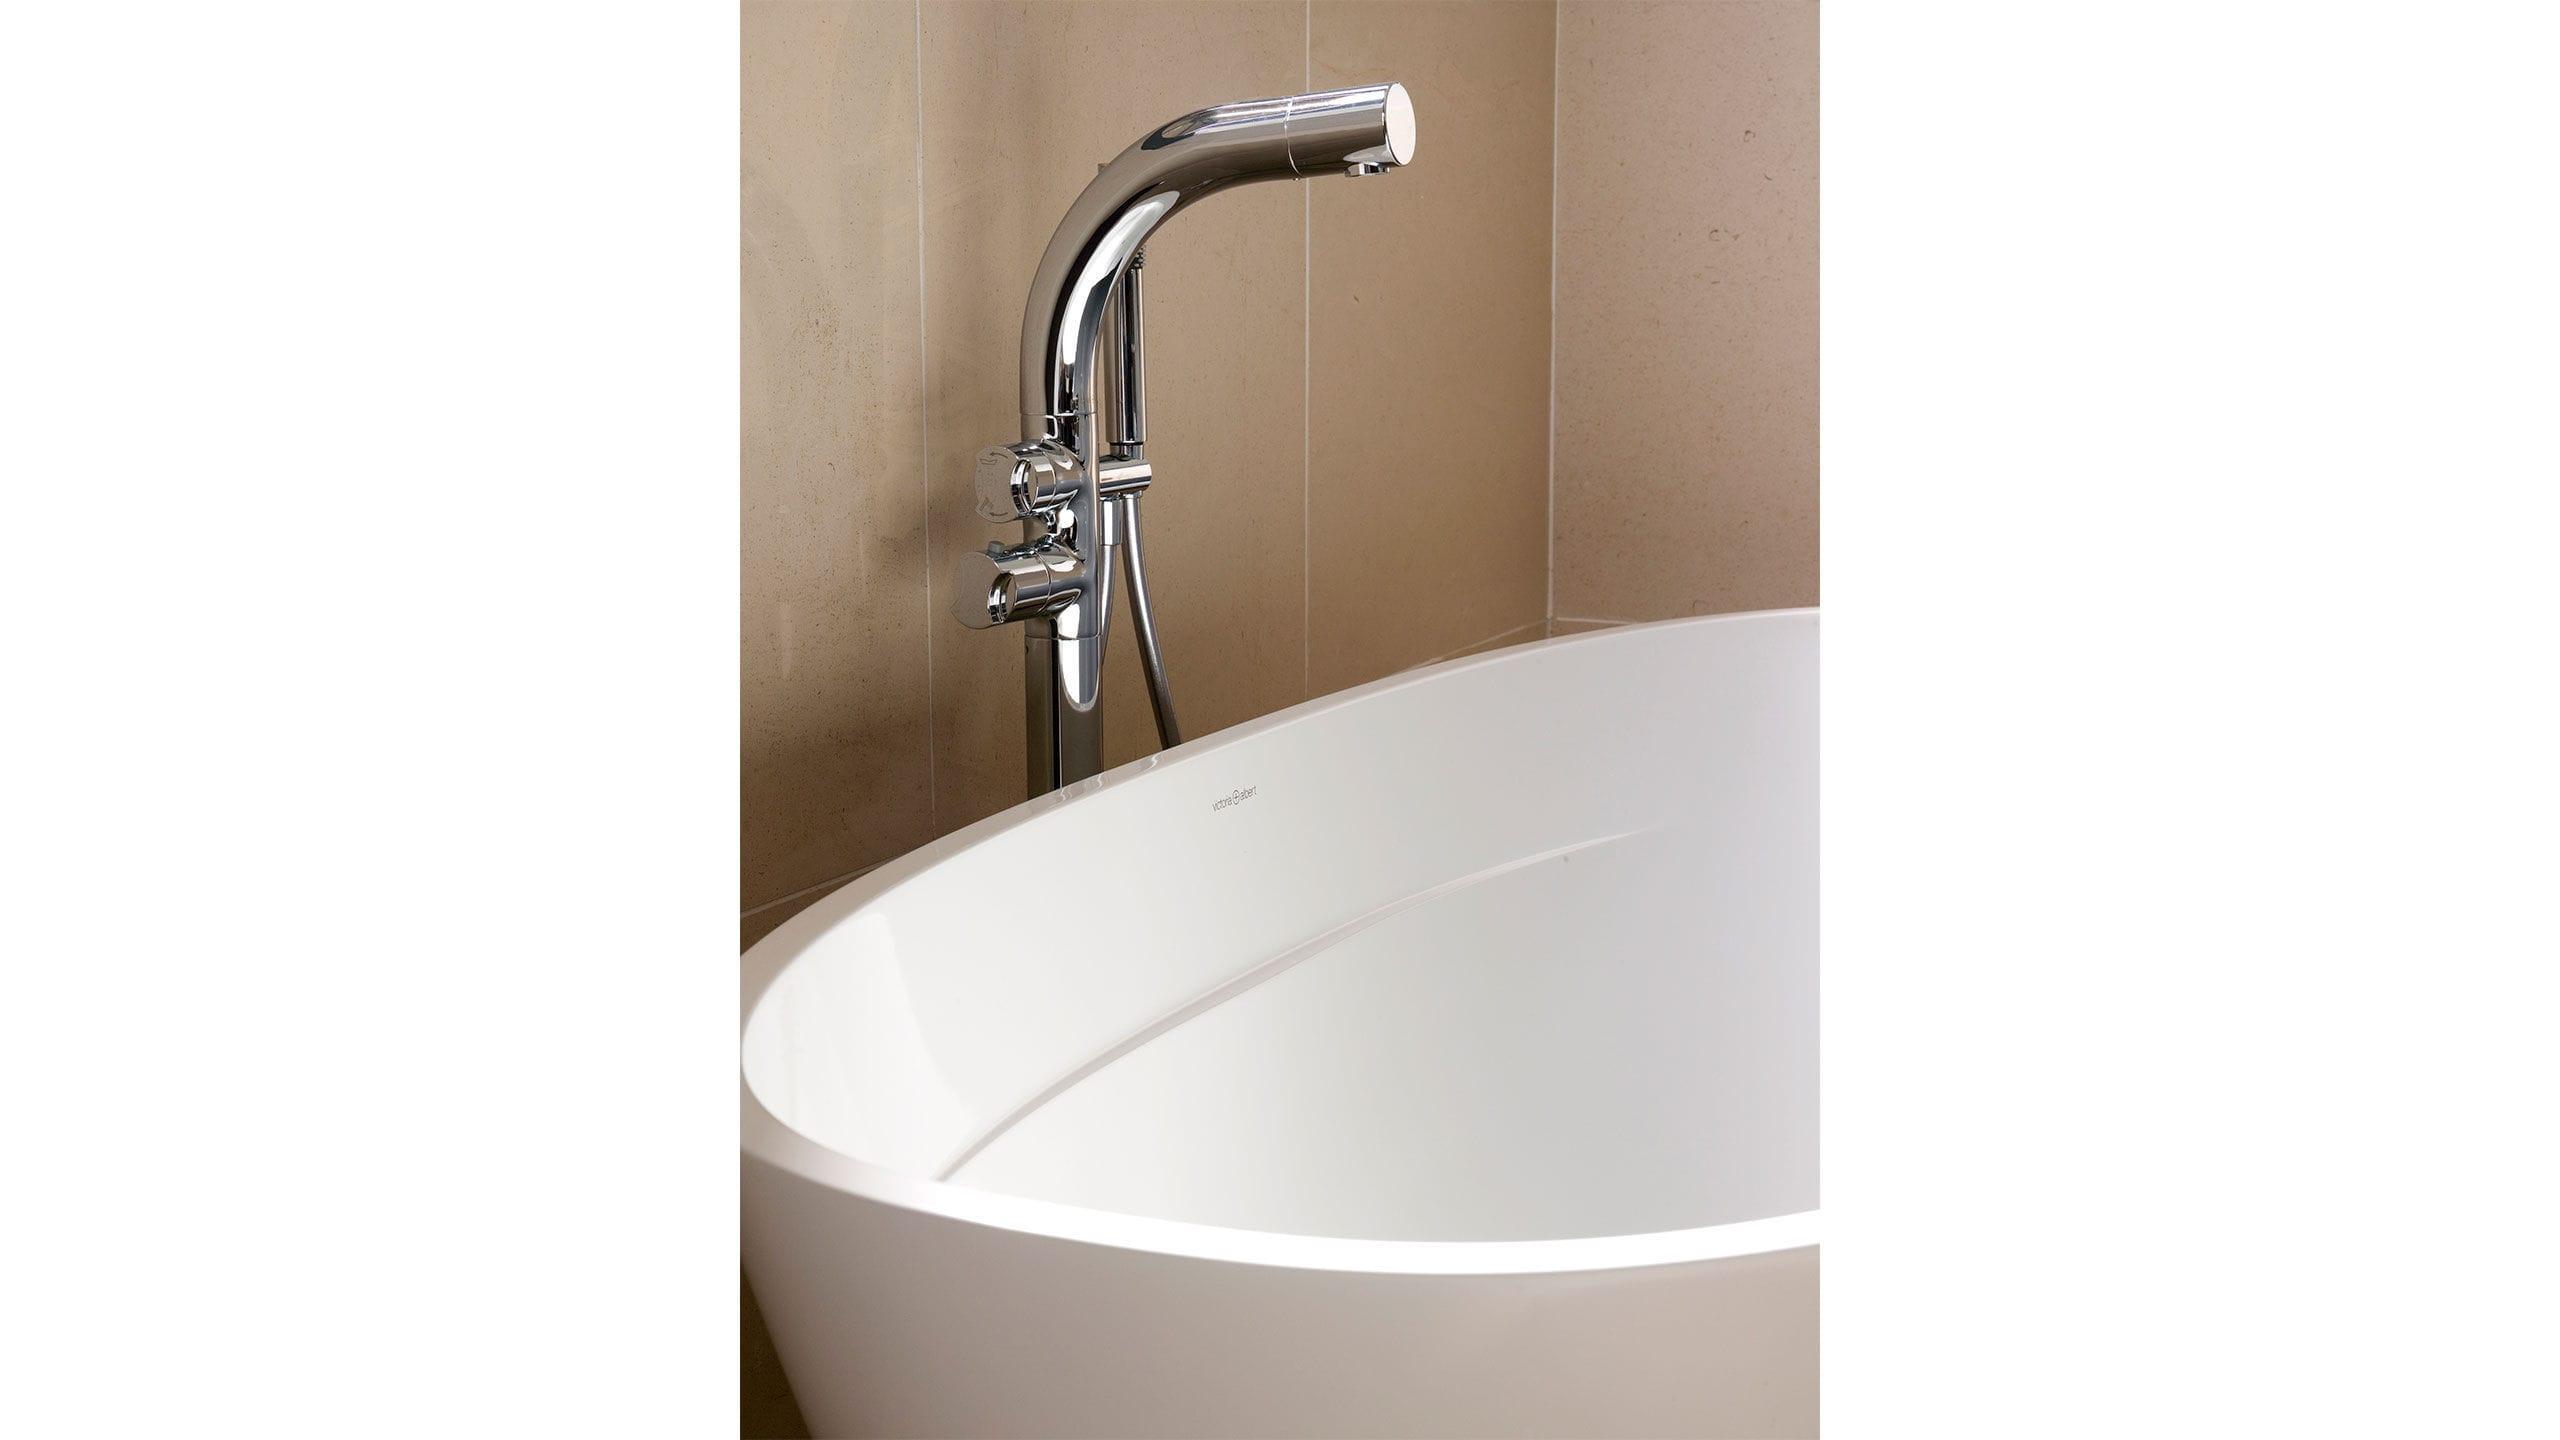 Vasca Da Bagno Sinonimo : Vasca da bagno ad isola ovale in resina in pietra calcarea